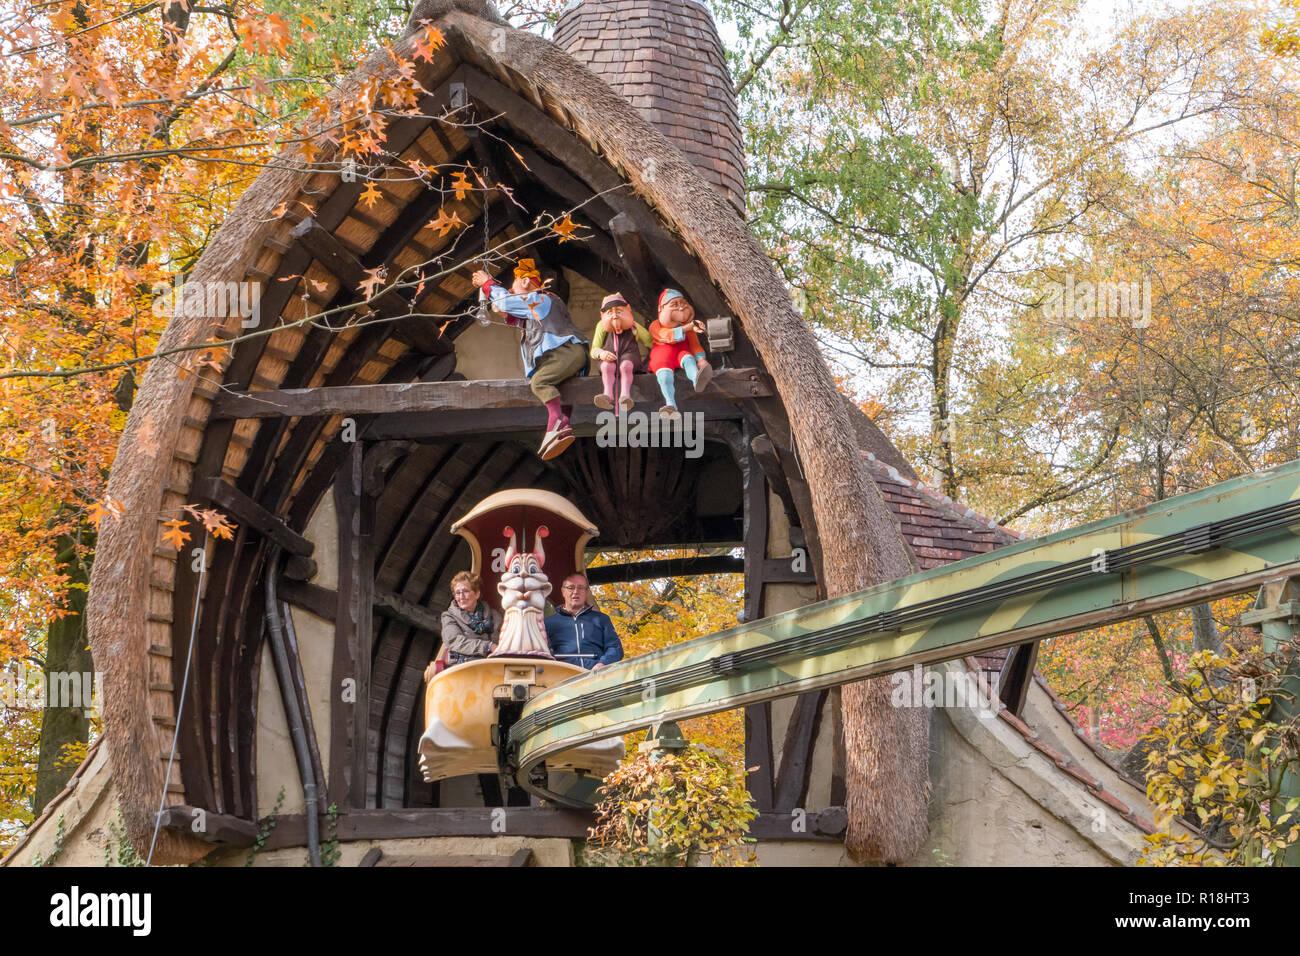 Grand parents sitting in monorail ride in entertainment park Efteling. Volk van Laaf attraction. - Stock Image